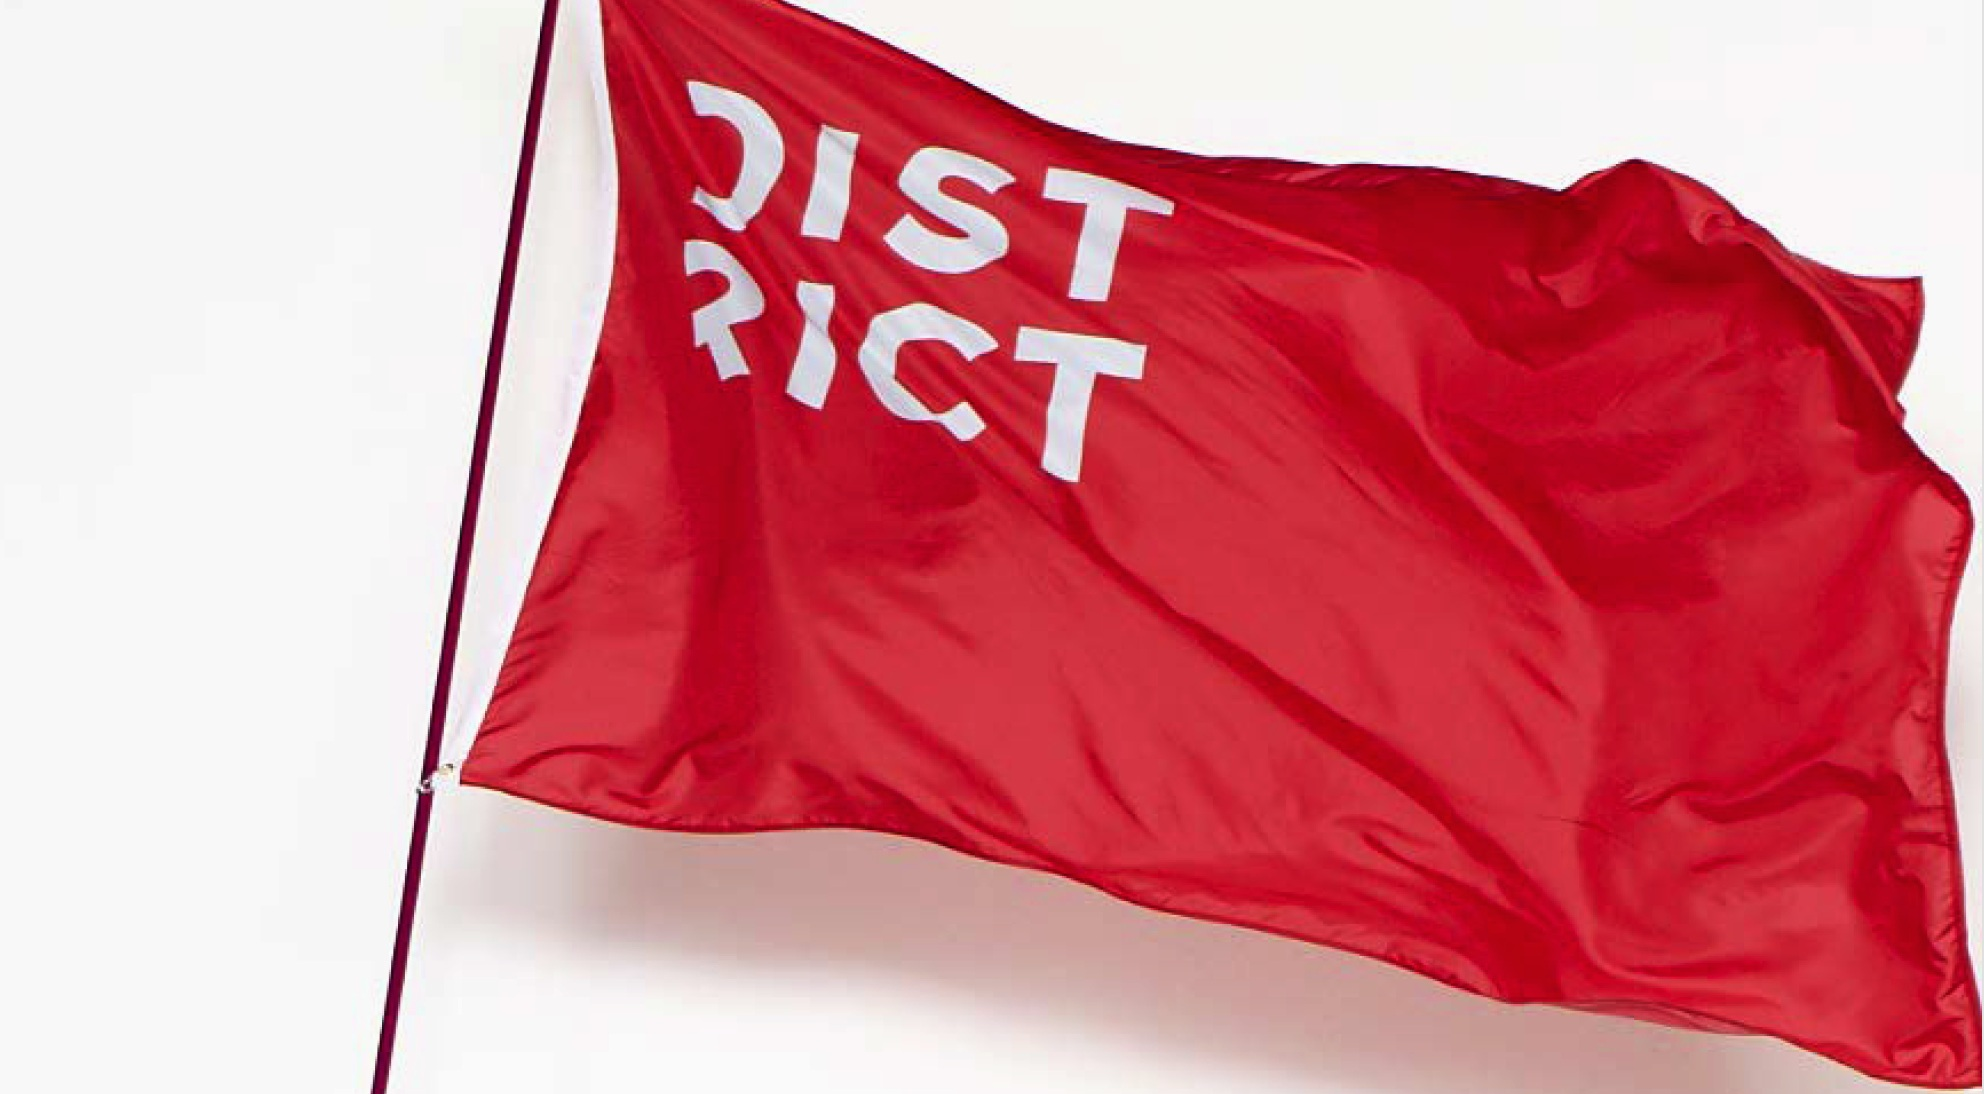 District+flag+image+.jpg